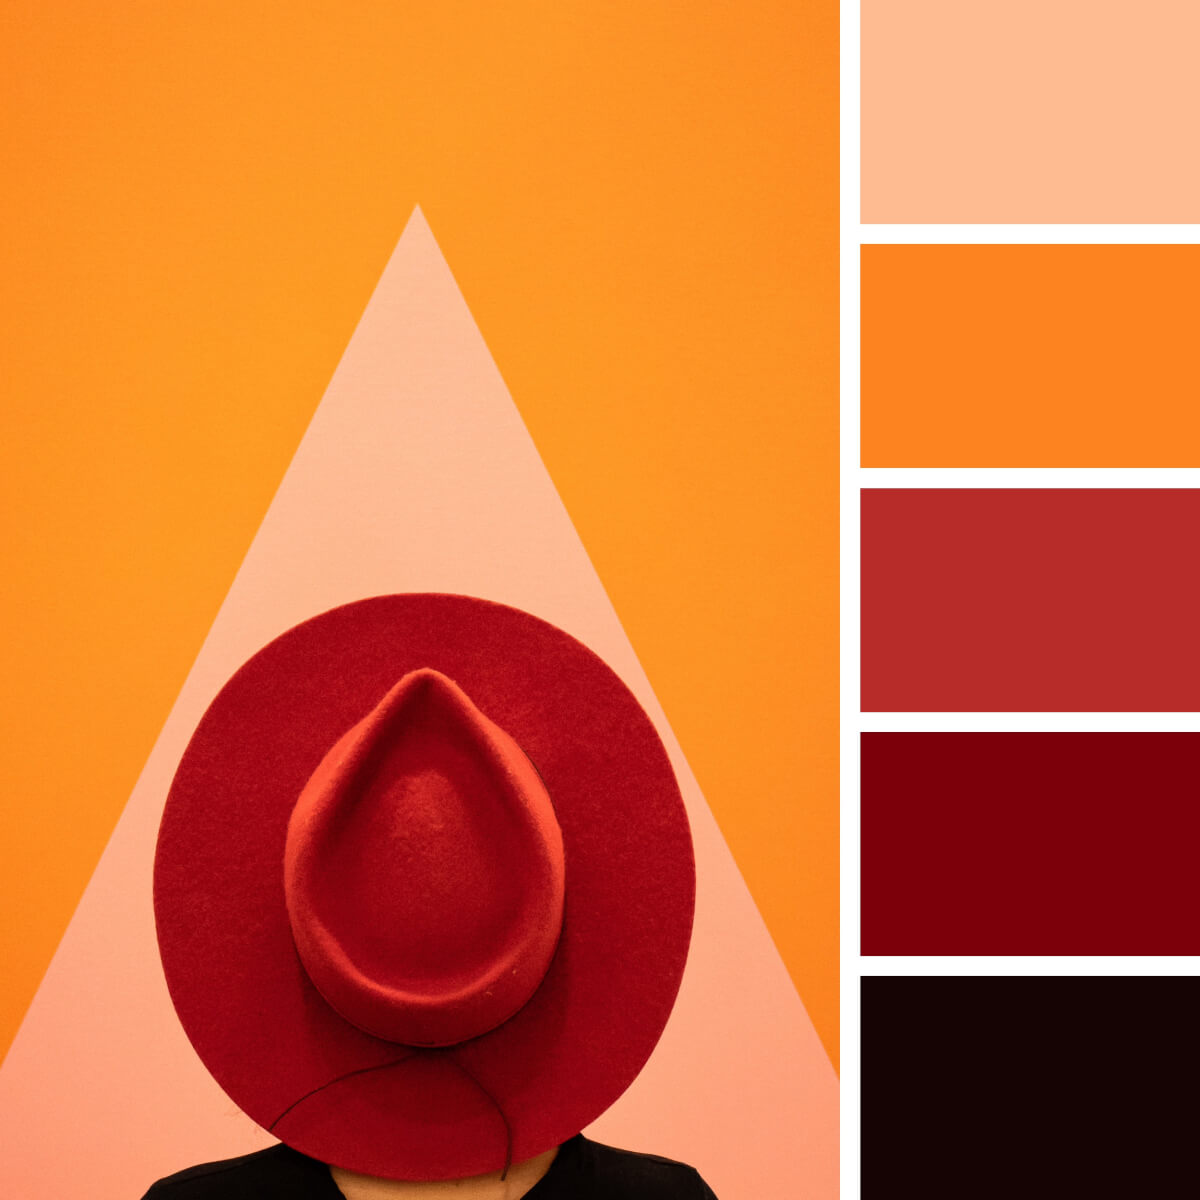 Juicy Red & Orange